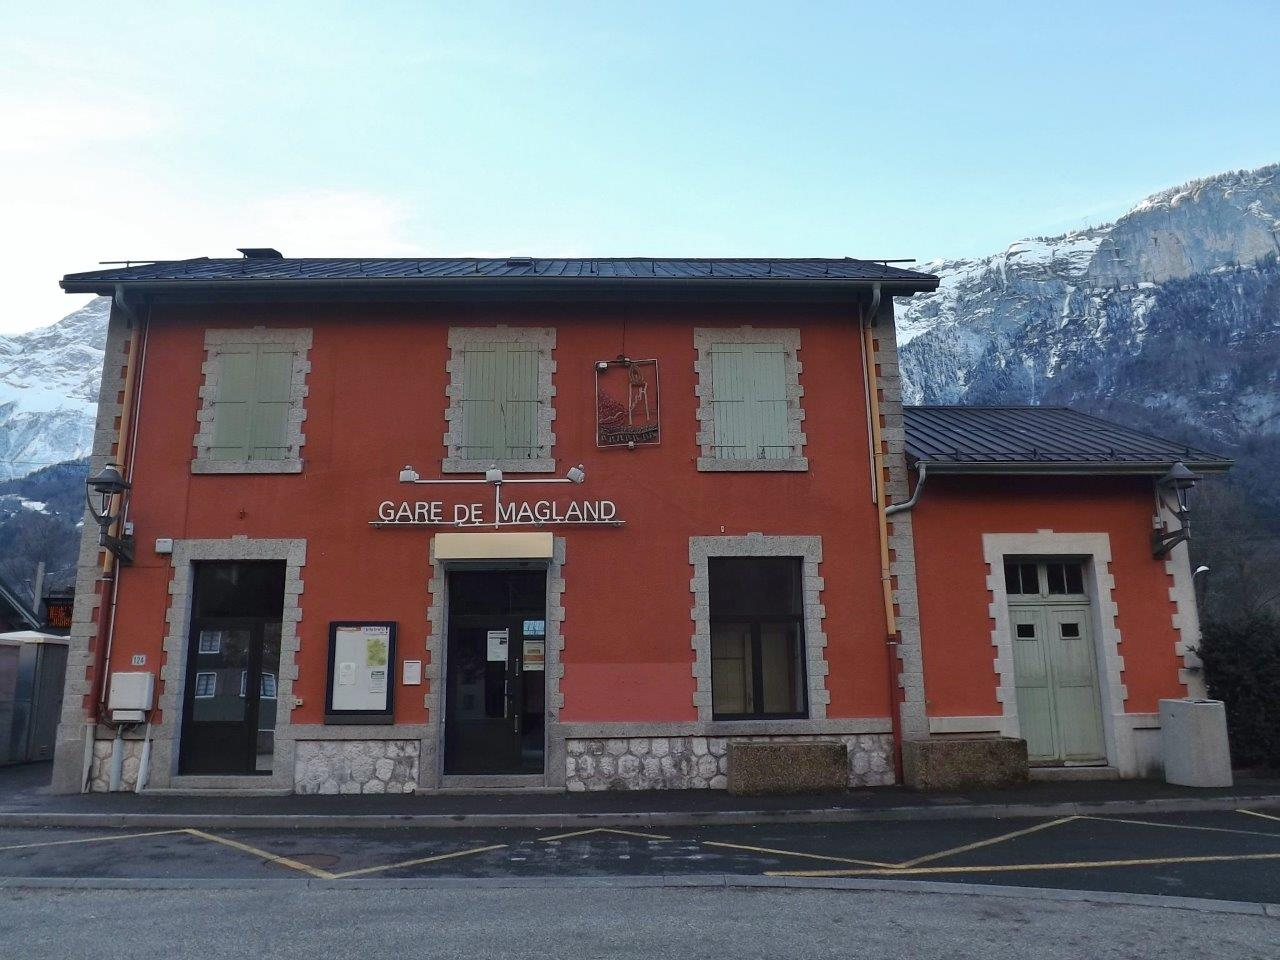 gare-de-magland-train-station